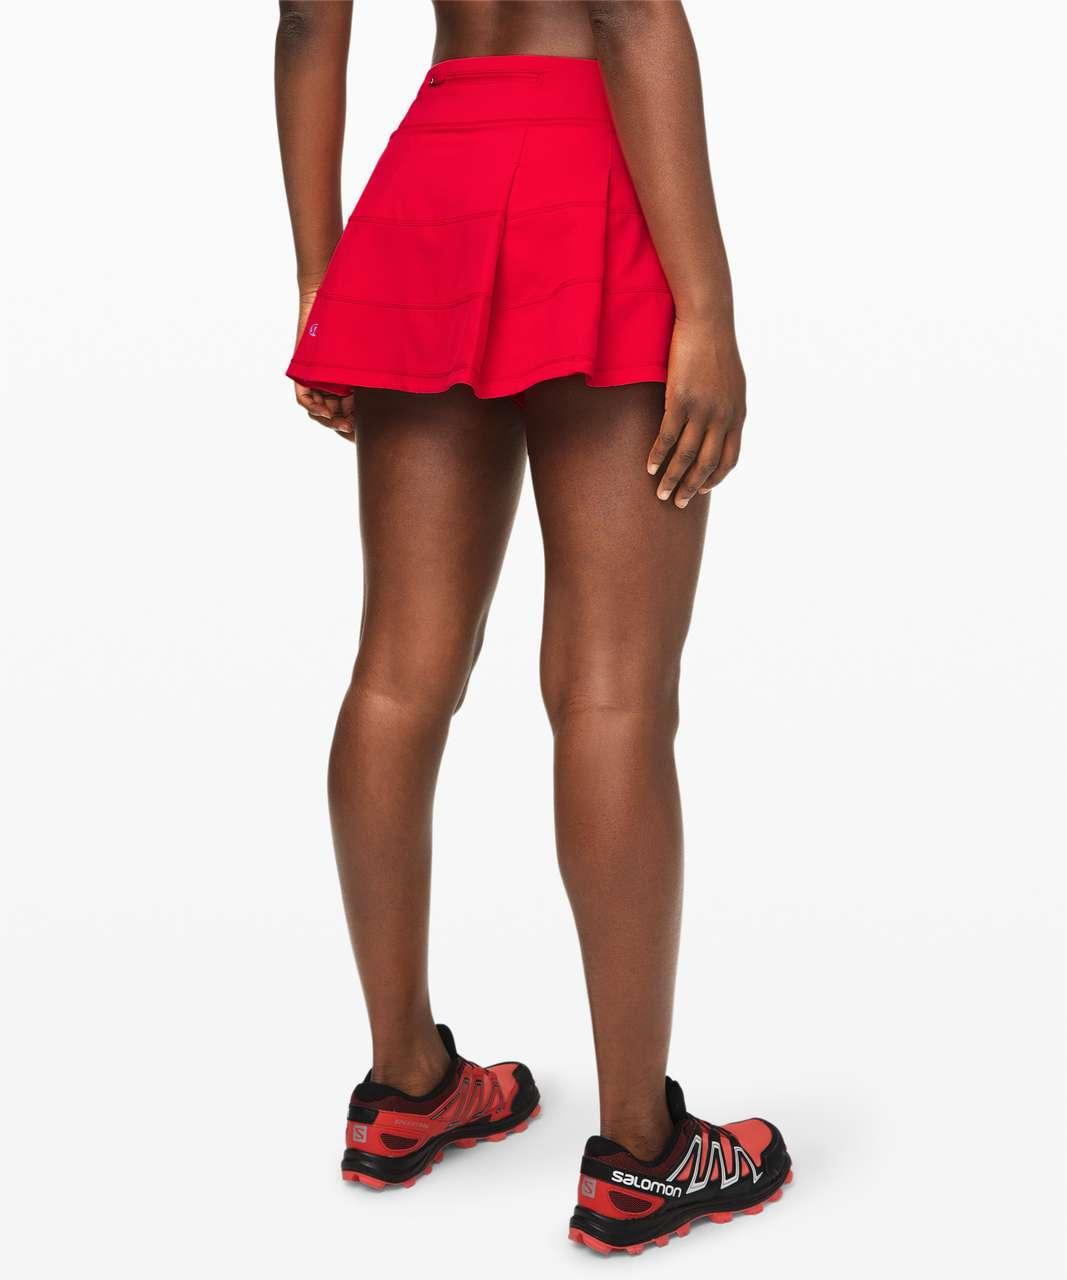 "Lululemon Pace Rival Skirt (Regular) *4-way Stretch 13"" - Dark Red"